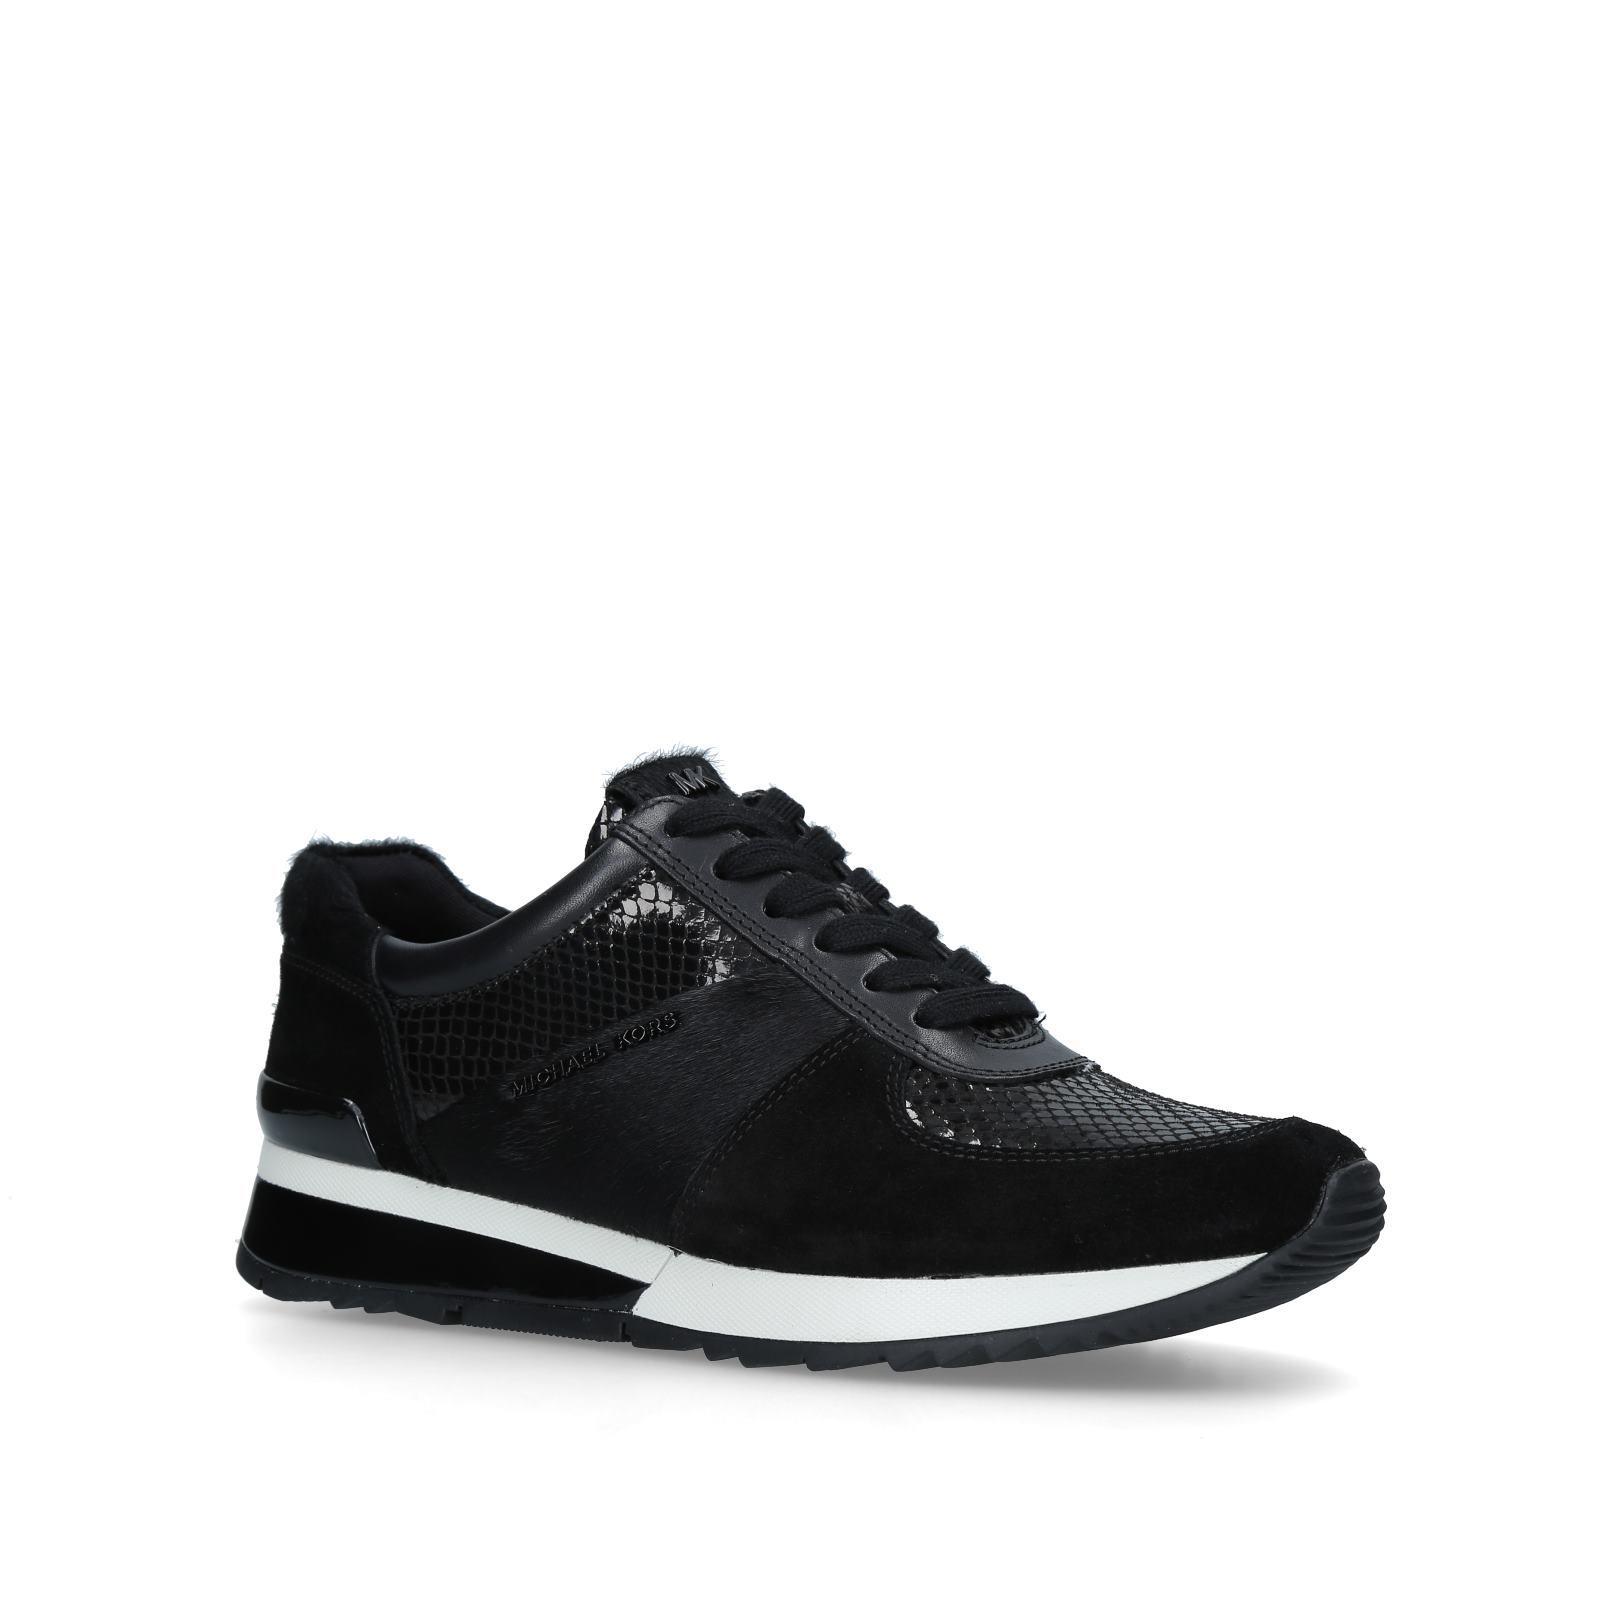 83f35972d9619 ALLIE WRAP TRAINER Allie Wrap Trainer No Heel Sneakers Michael Michael Kors  Black by MICHAEL MICHAEL KORS